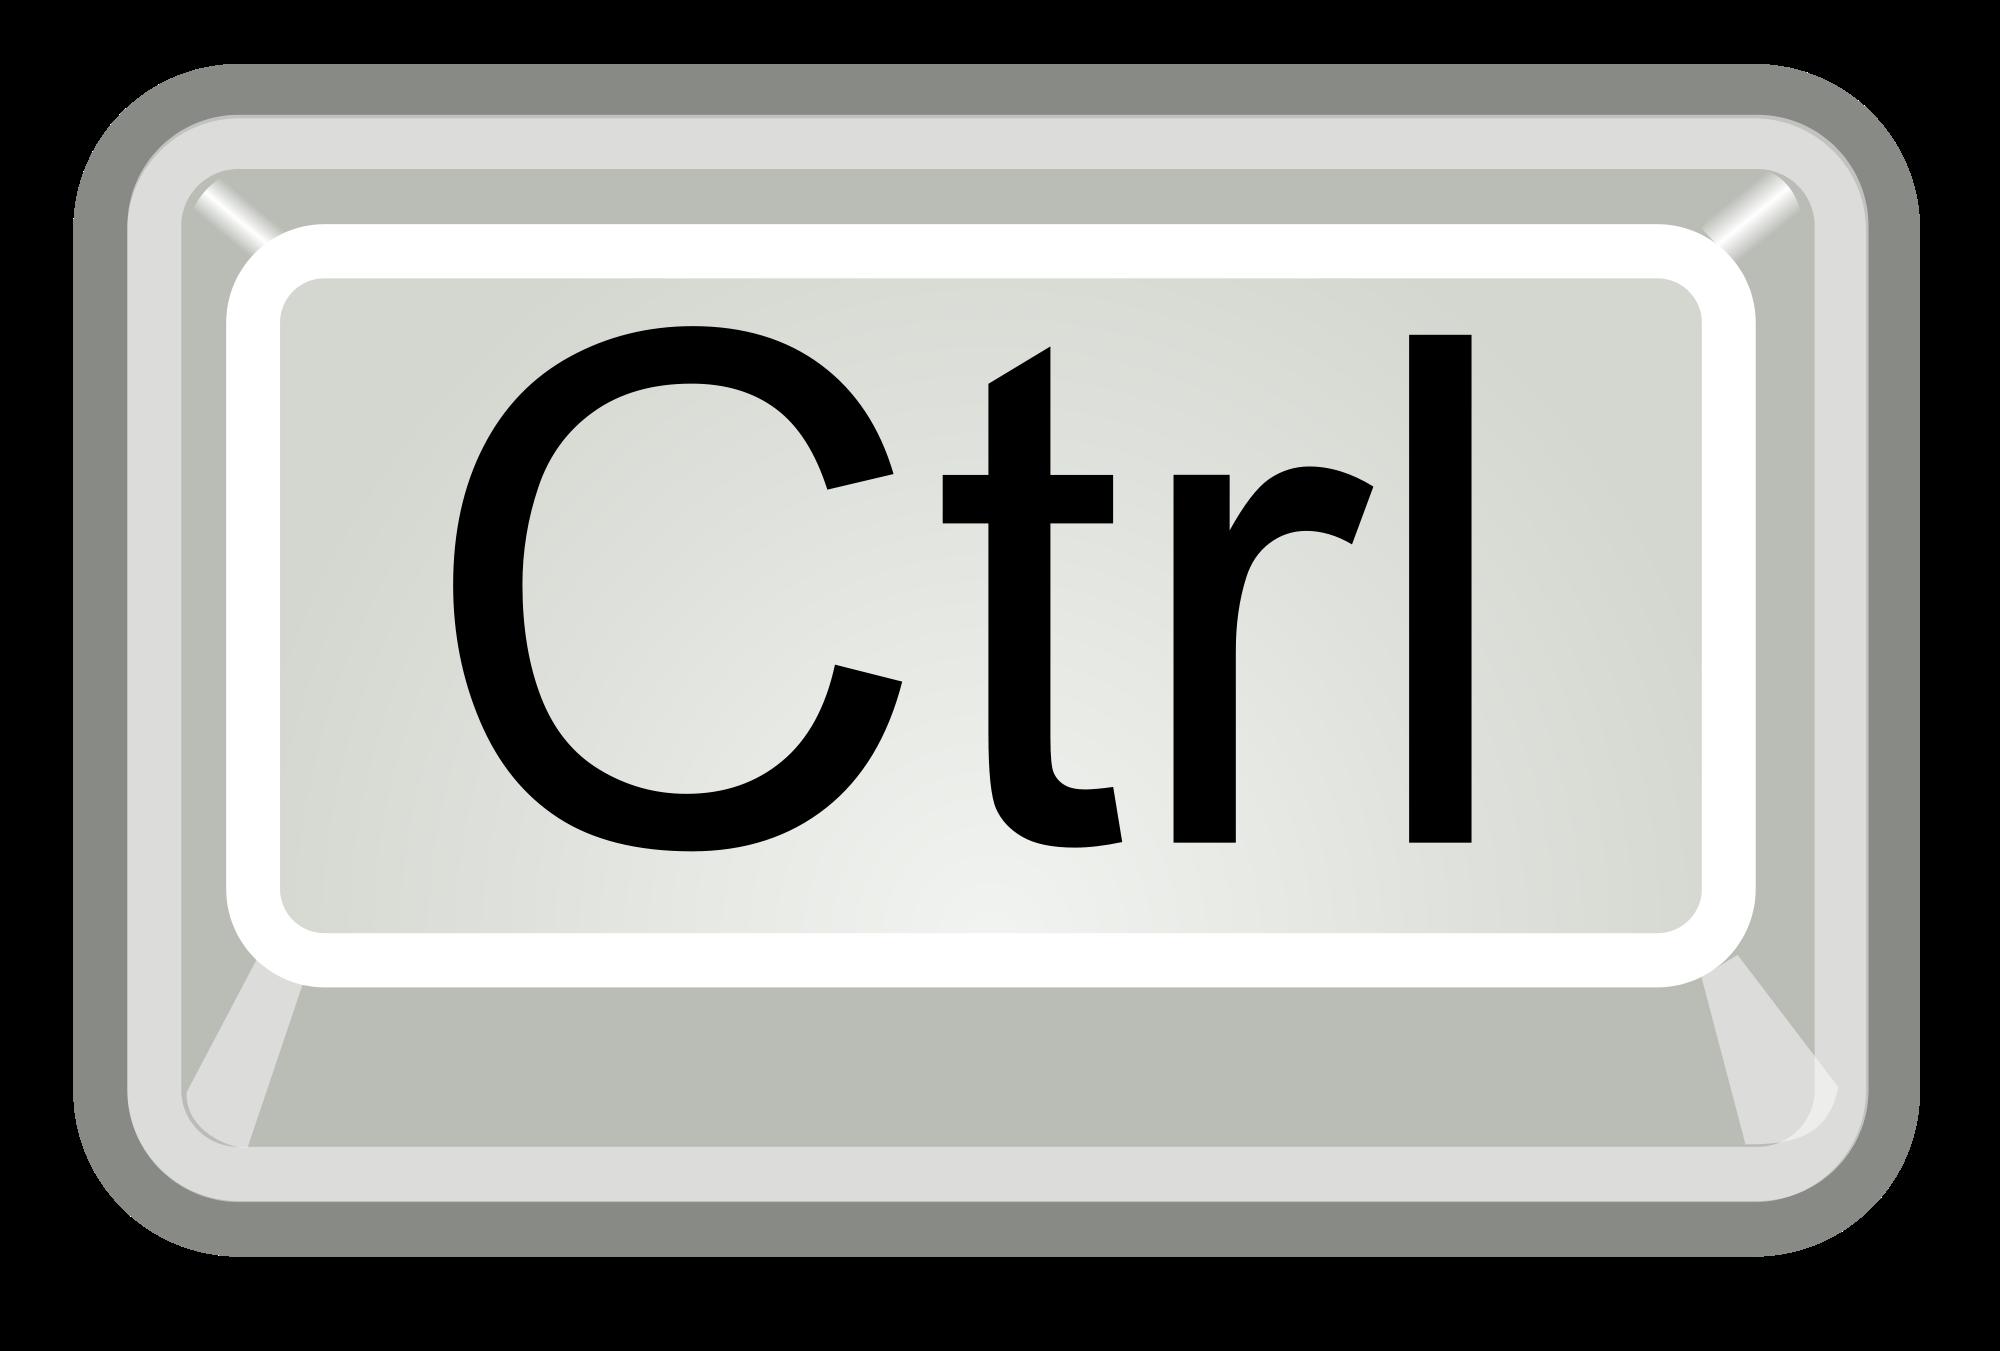 Ctrl Key PNG - 133346